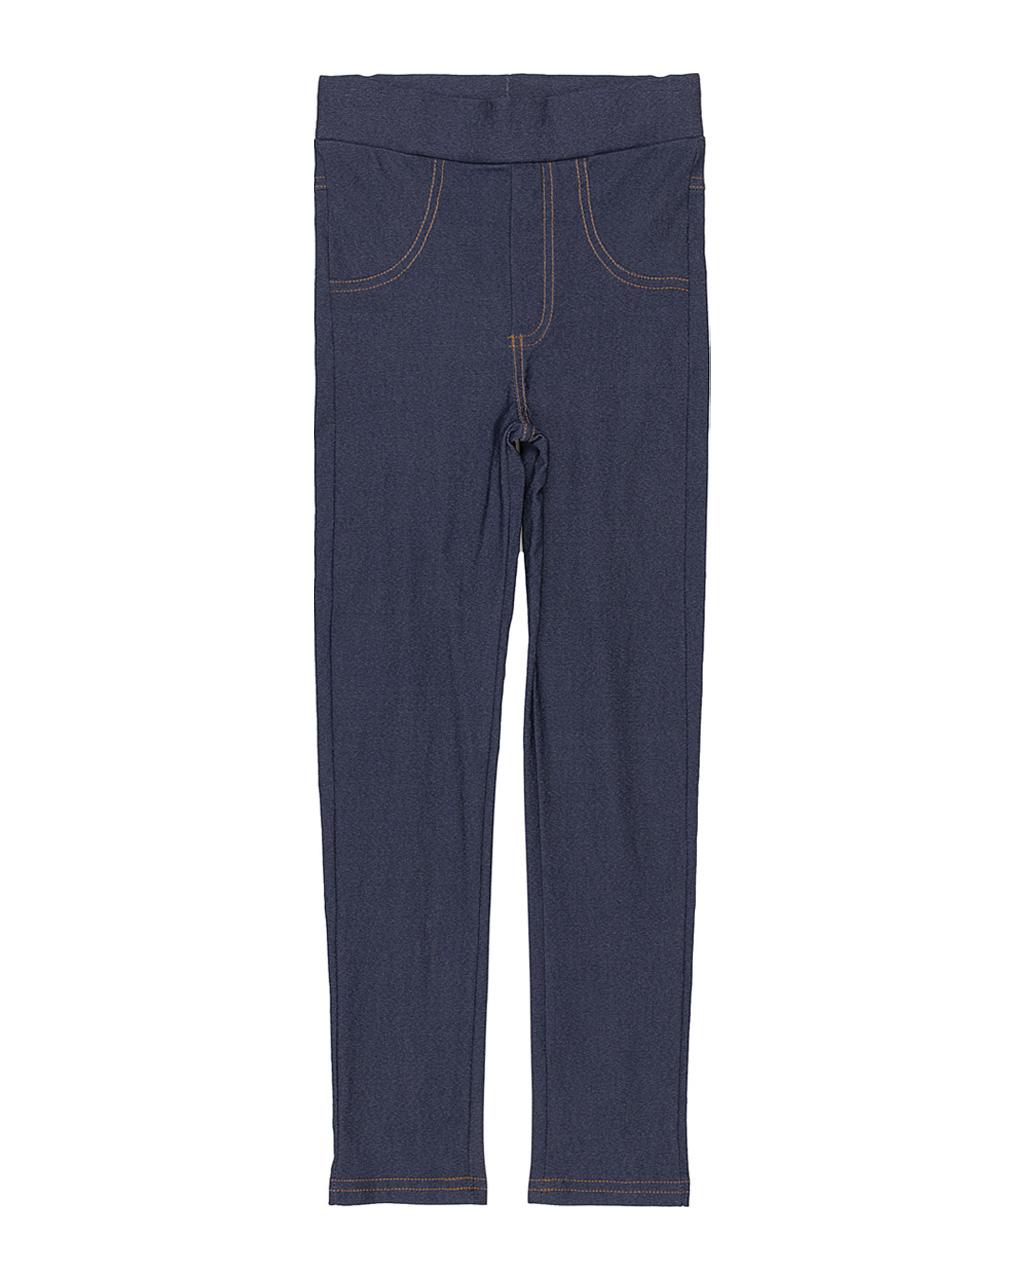 Calça Infantil Montaria Azul Jeans Momi